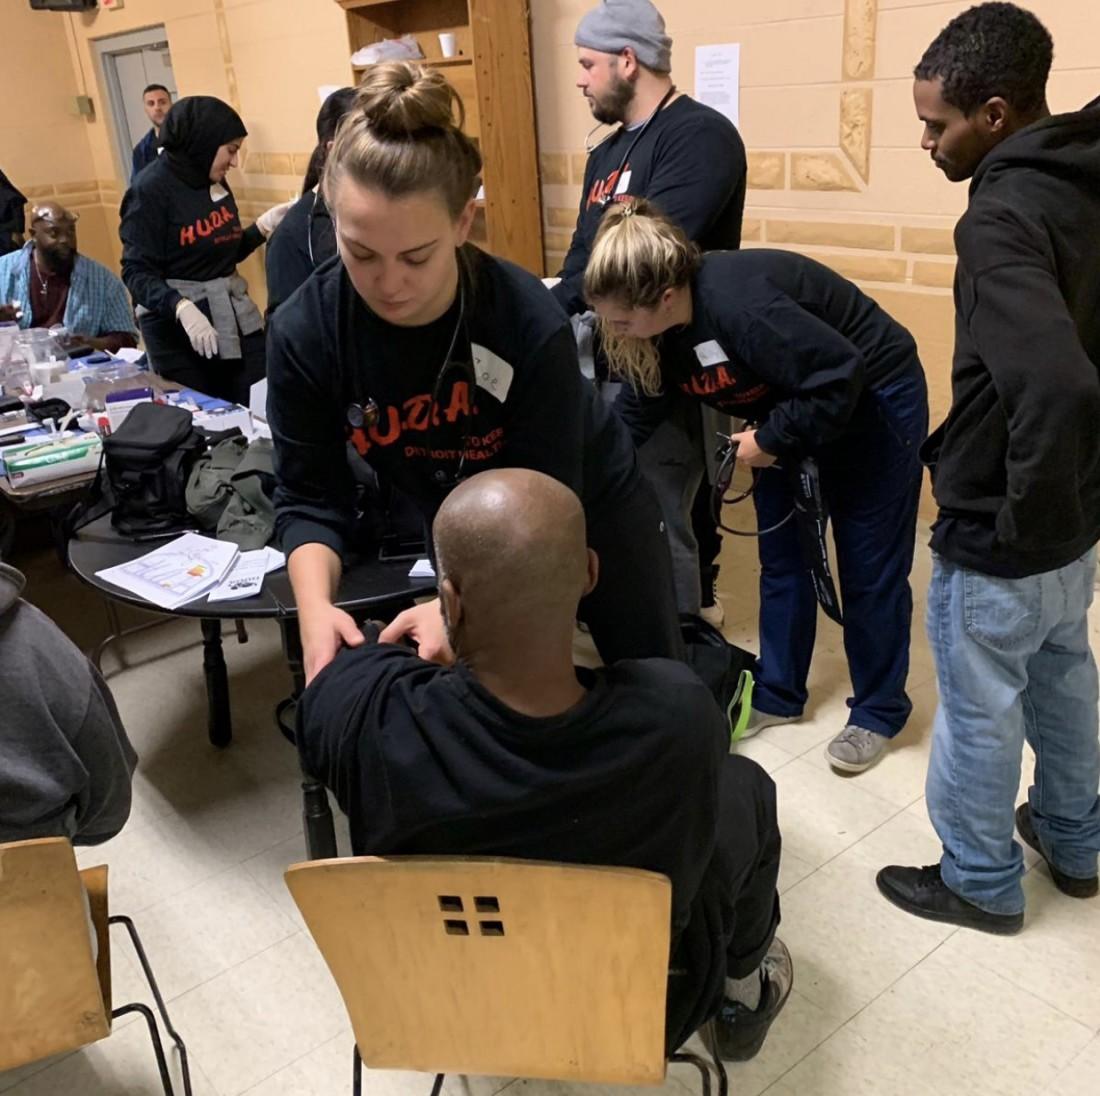 Free Clinic Detroit: Community Heath Center - No Insurance